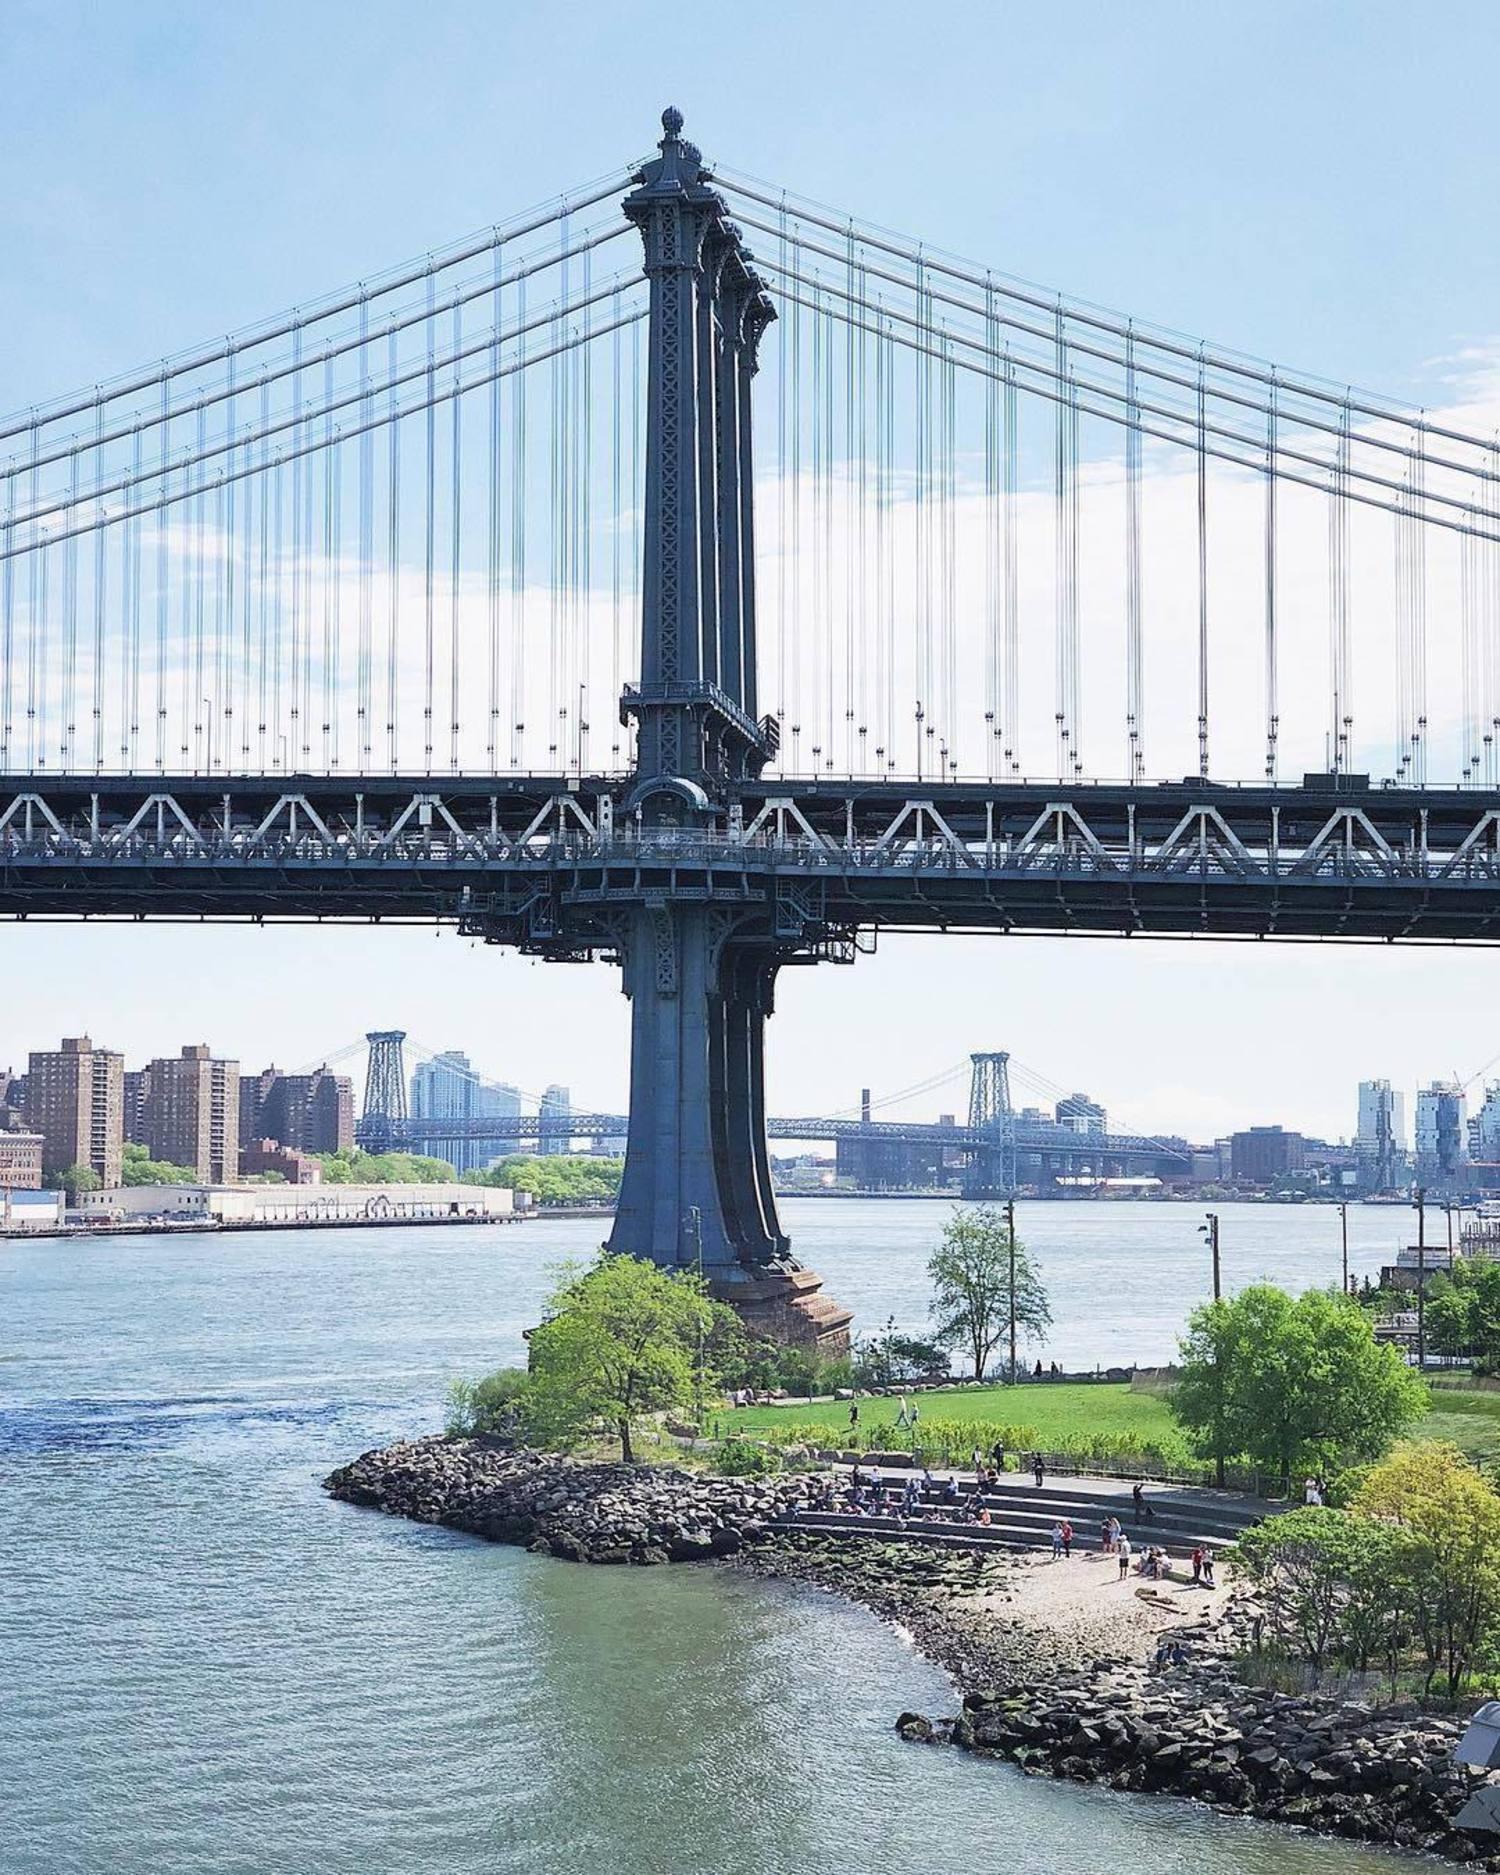 Manhattan Bridge, Brooklyn. Photo via @melliekr #viewingnyc #newyork #newyorkcity #nyc